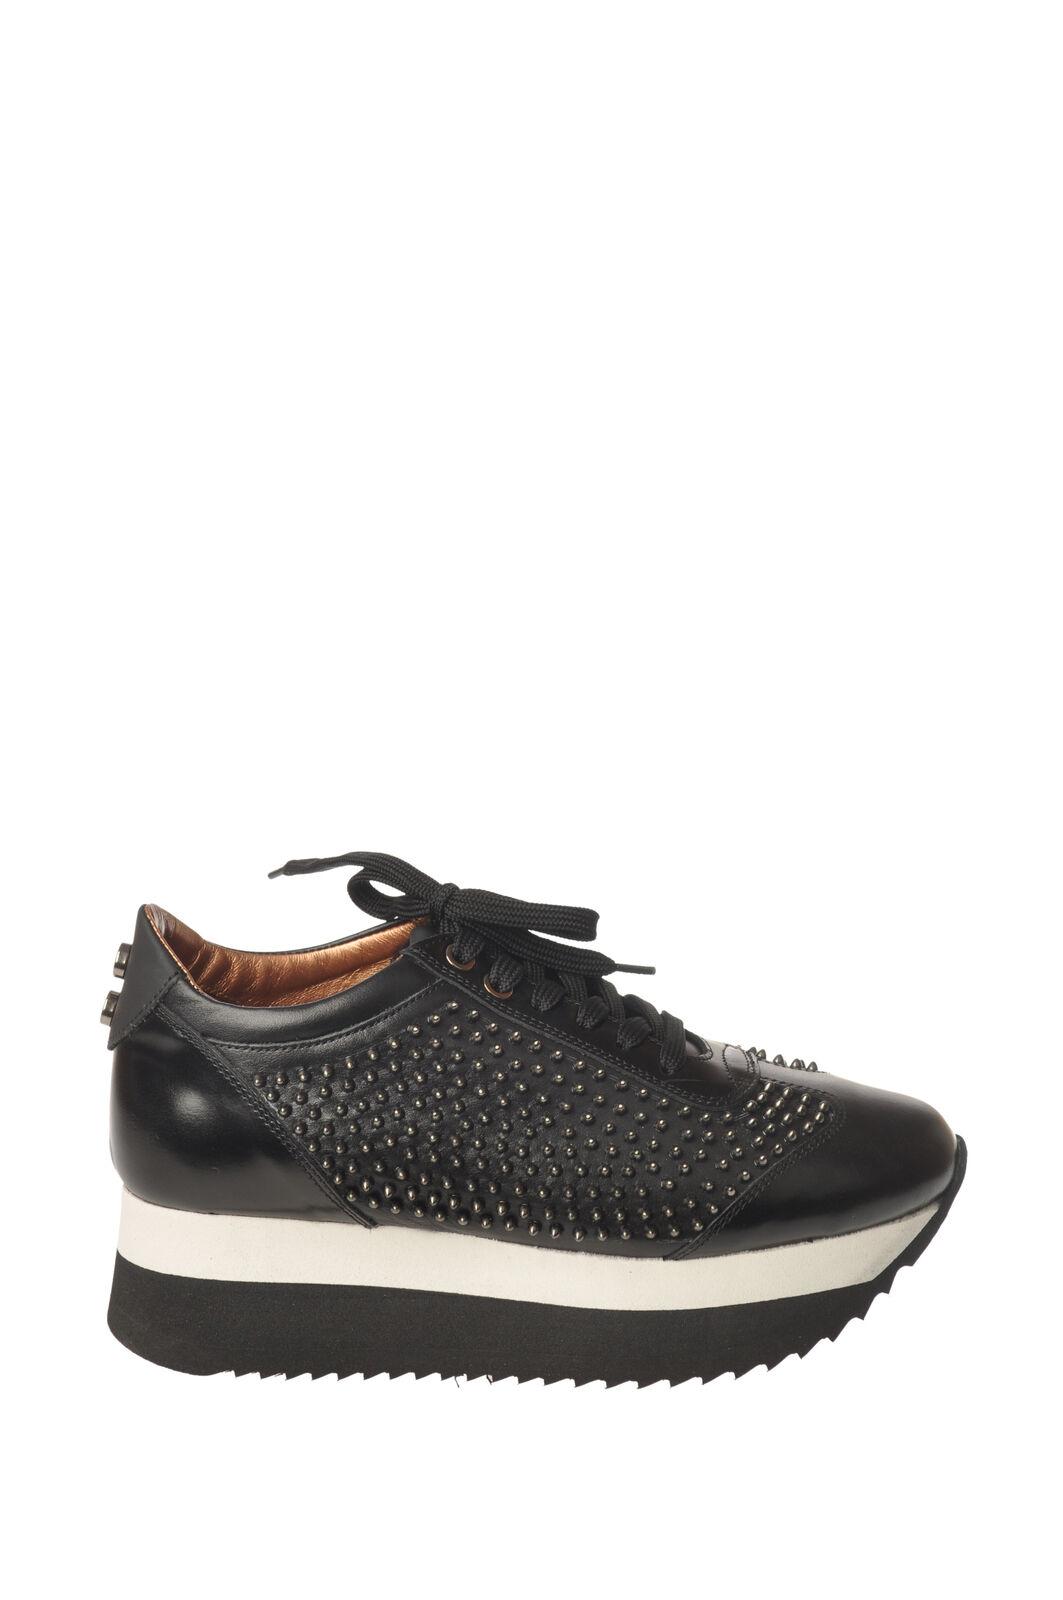 Alexander SMITH-scarpe-scarpe da ginnastica bassa donna-Nero - 5771519L183620